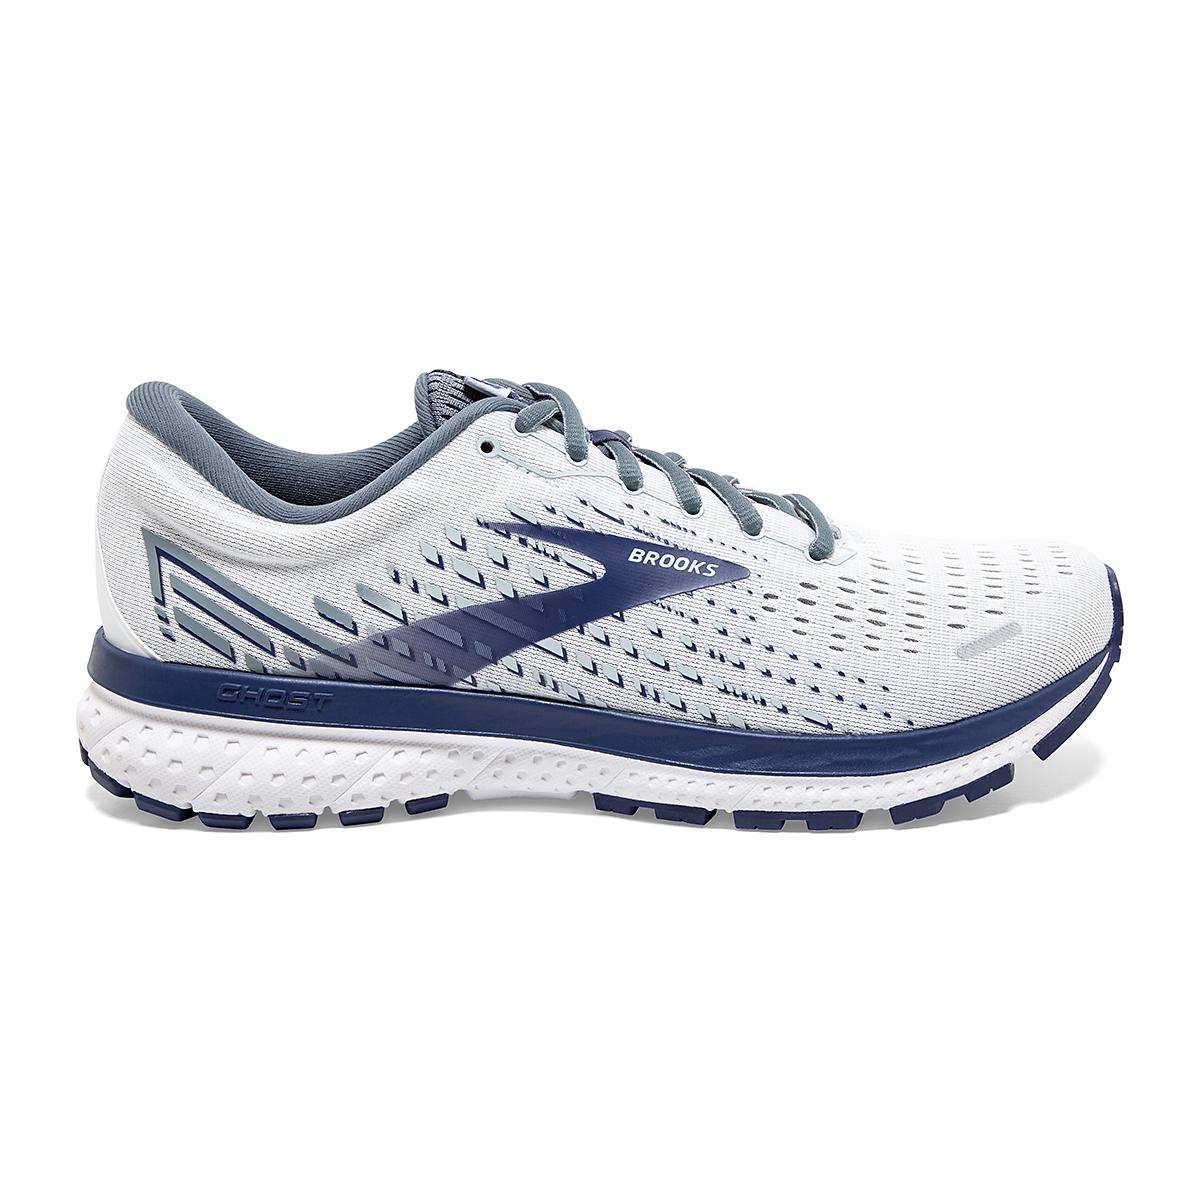 Men's Brooks Ghost 13 Running Shoe - Color: White/Grey/Deep Cobalt - Size: 7 - Width: Extra Wide, White/Grey/Deep Cobalt, large, image 1